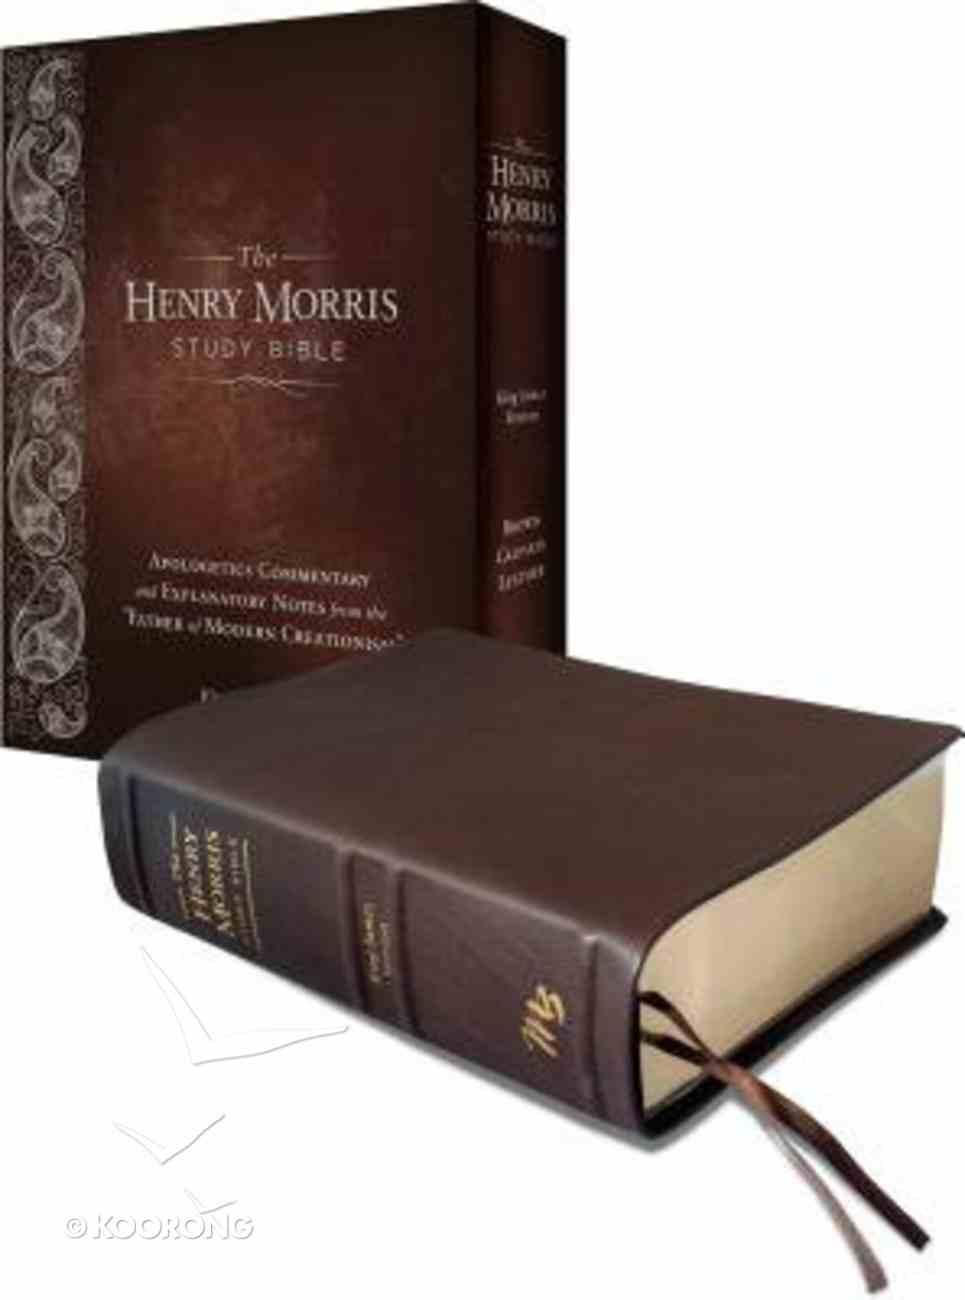 KJV Henry Morris Study Bible Brown Calfskin Leather Genuine Leather